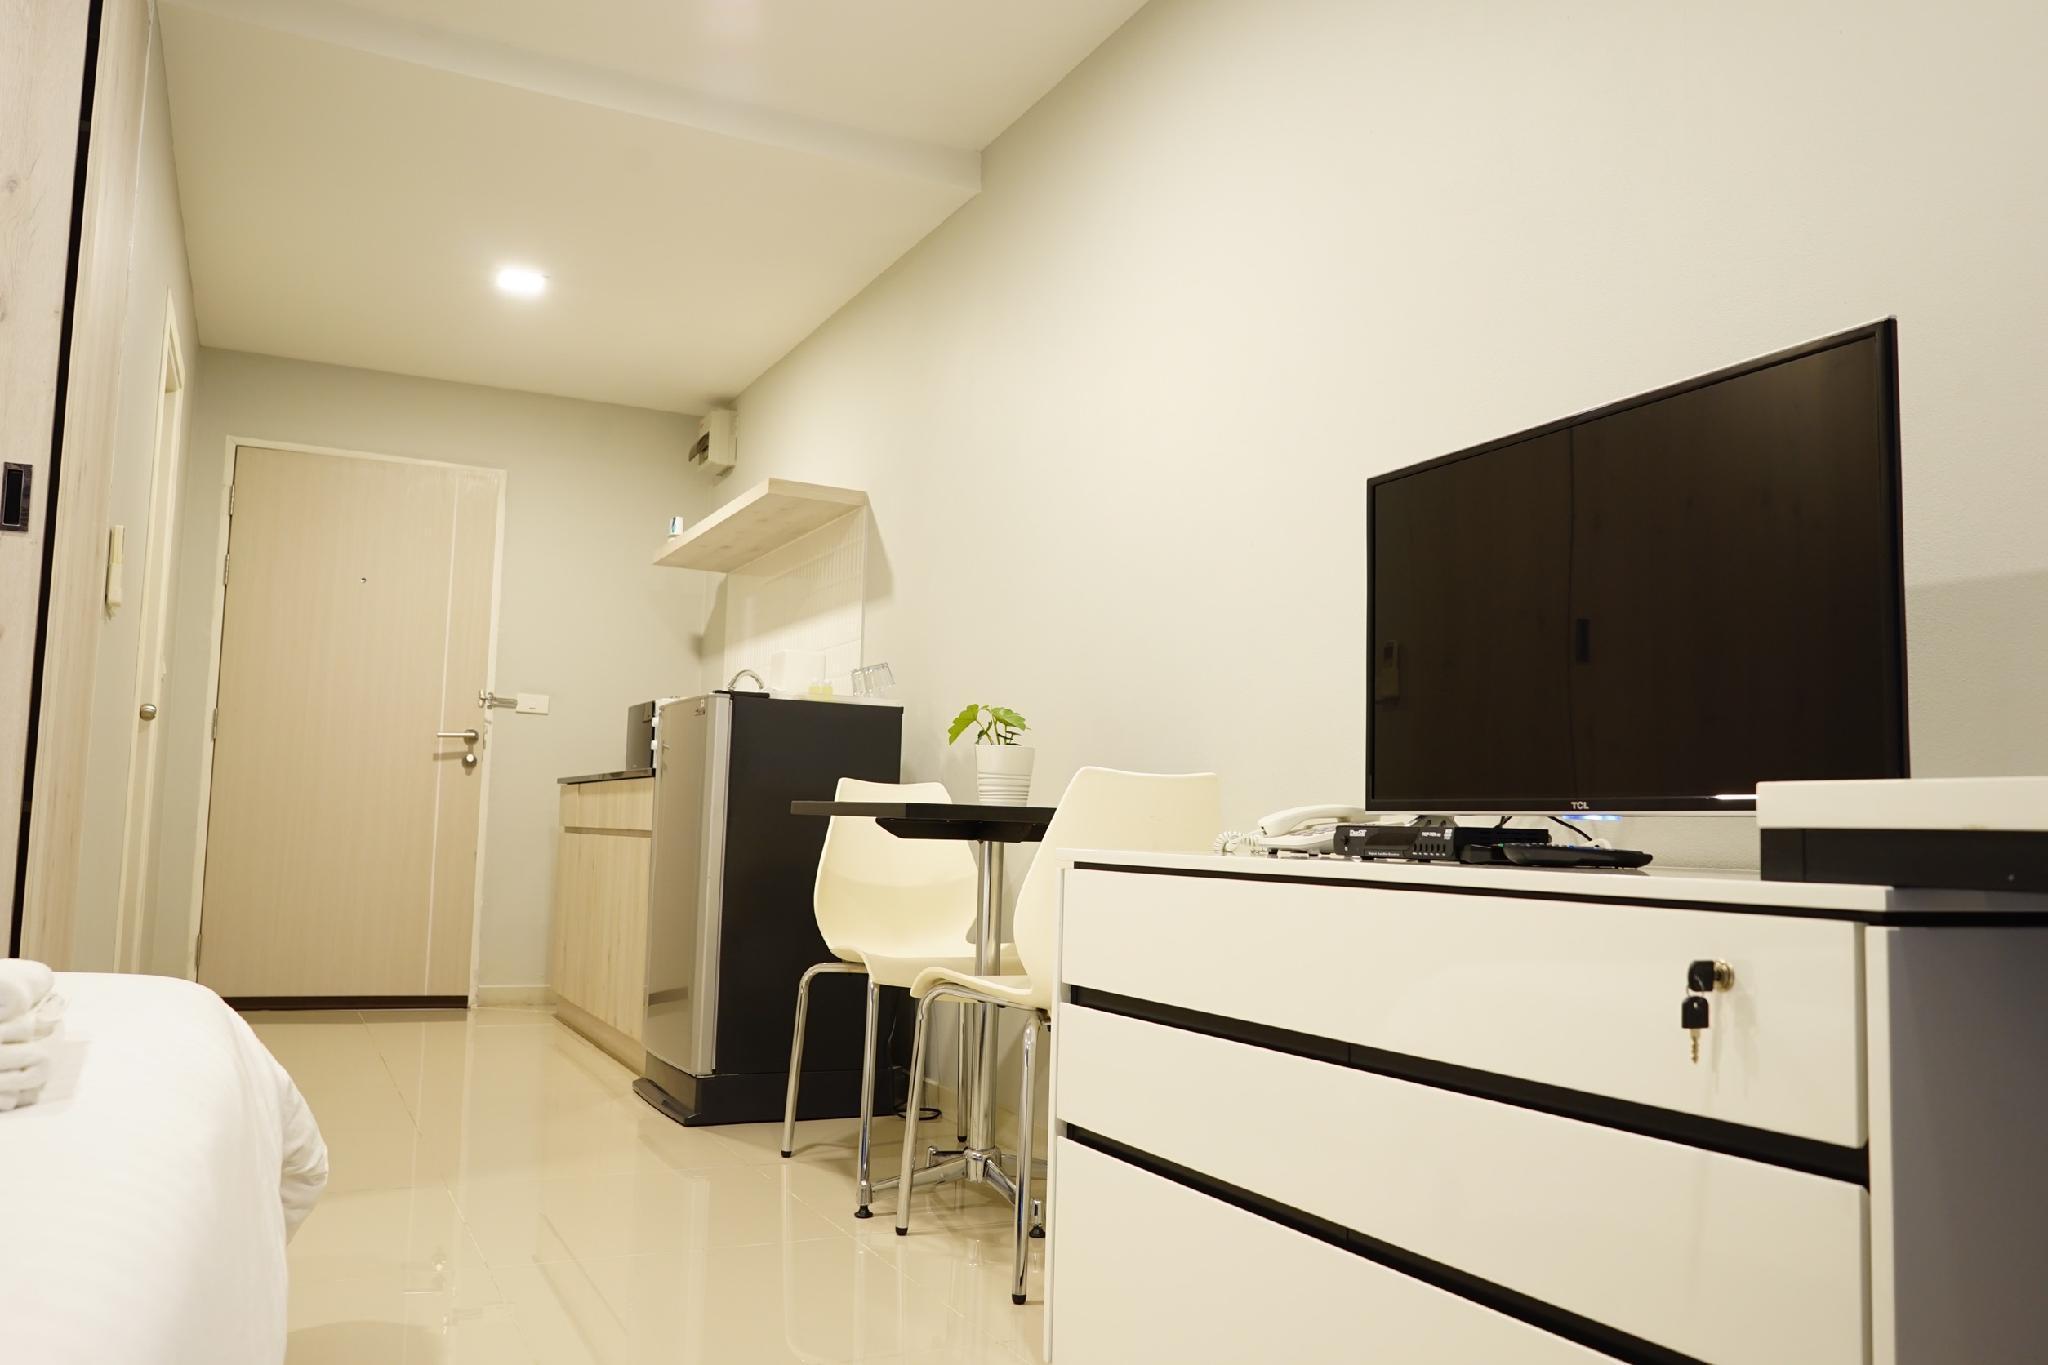 LKN GRAND 295 Room 305